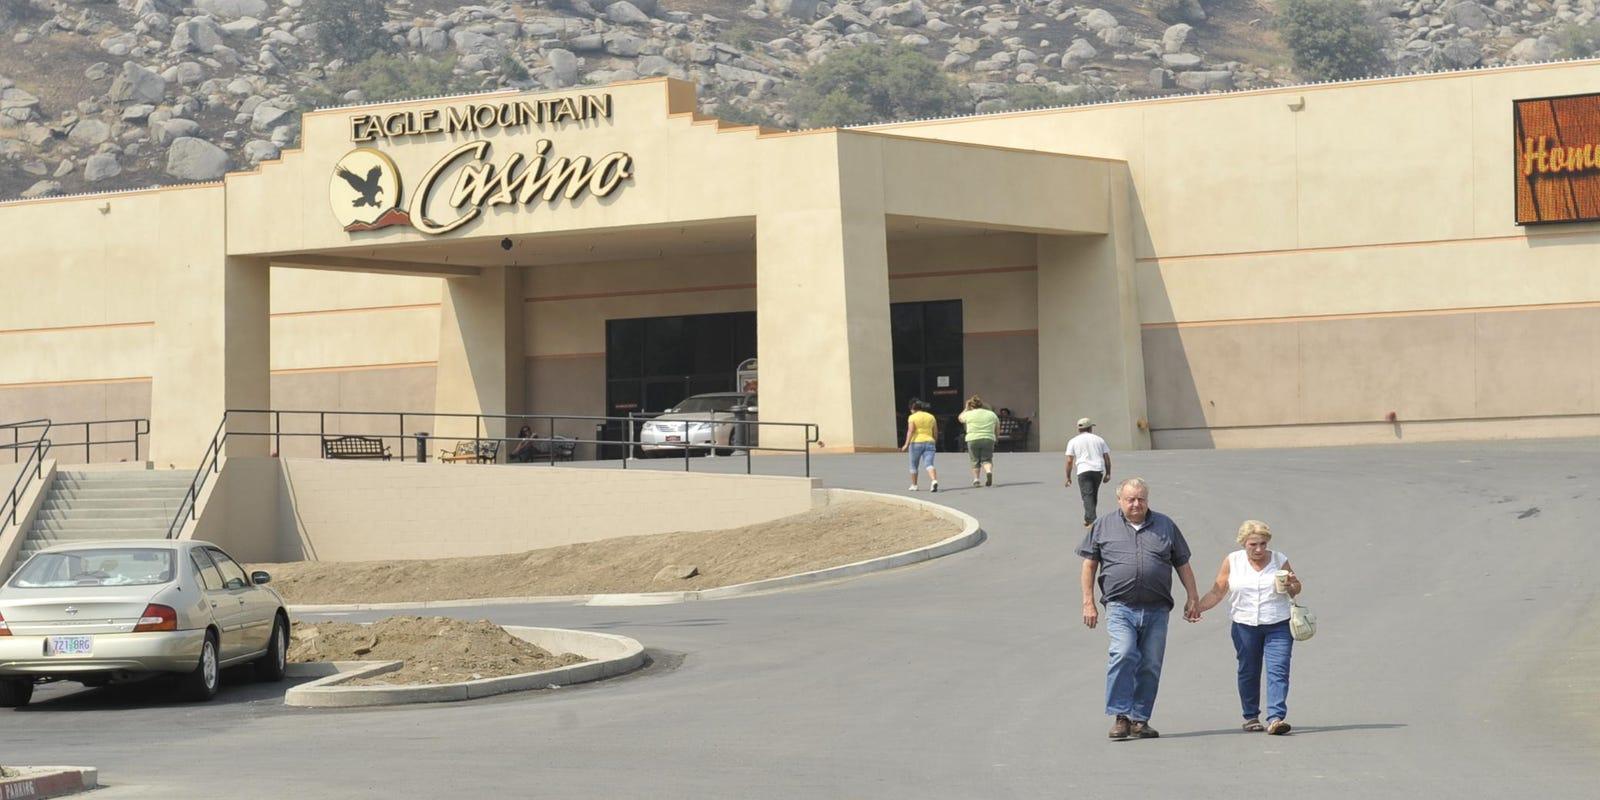 Eagle Mountain Casino closer to relocating to Porterville - Visalia Times-Delta and Tulare Advance-Register